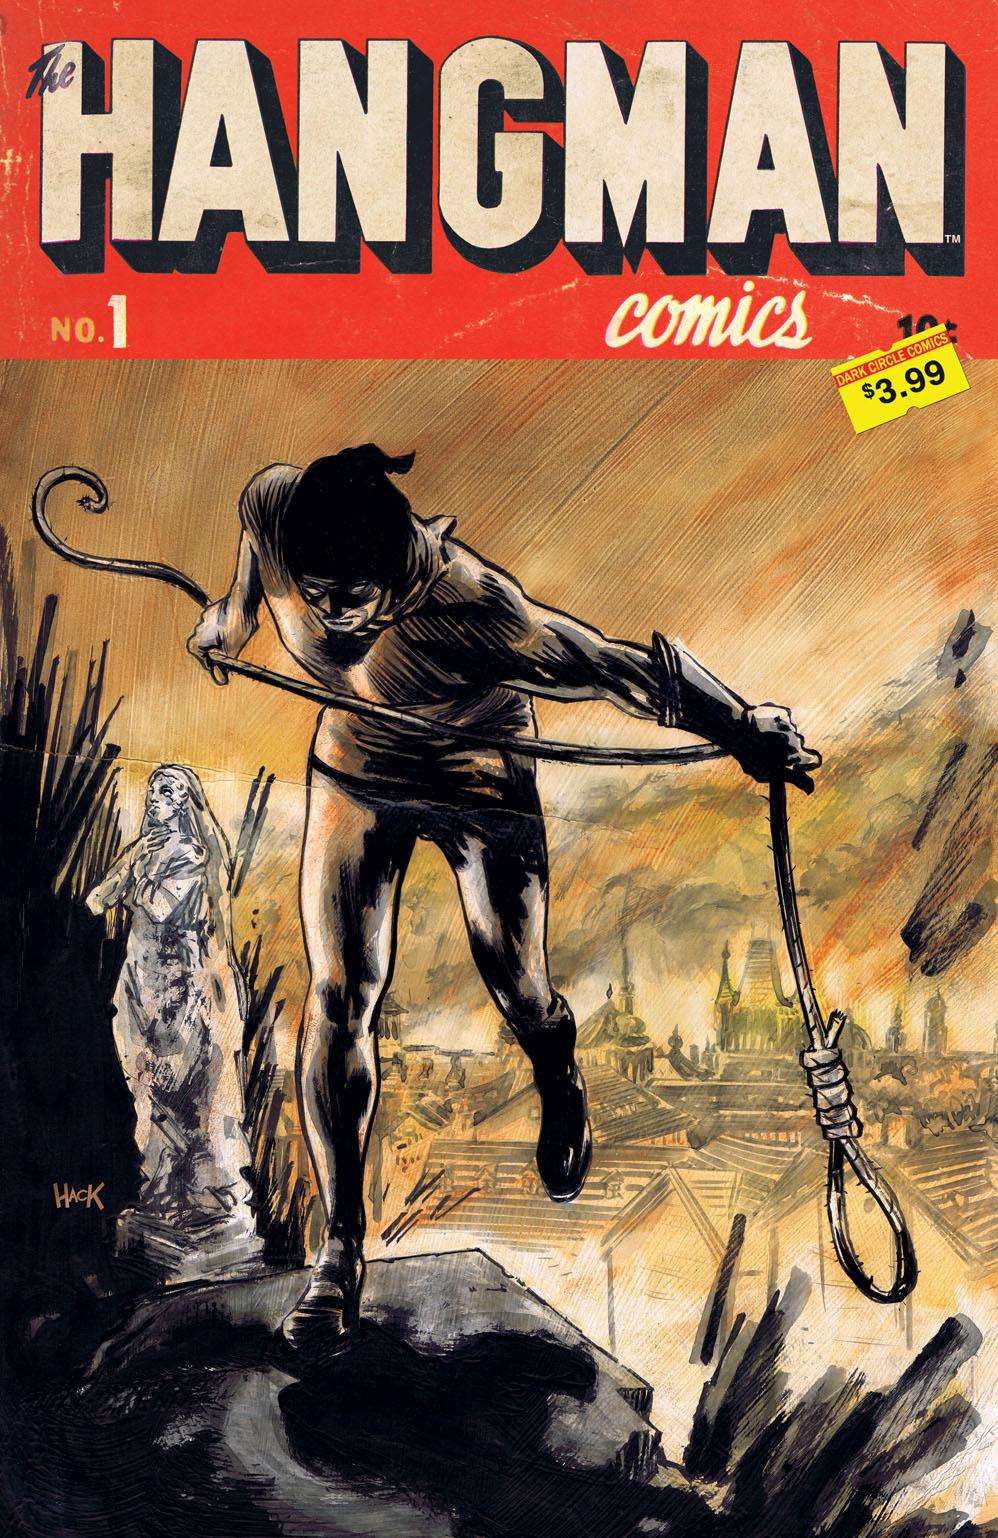 Archie comics archie comics sneak peek of the week major spoilers - Hangman 1_bradstreet Hangman 1_ff Hangman 1_hack